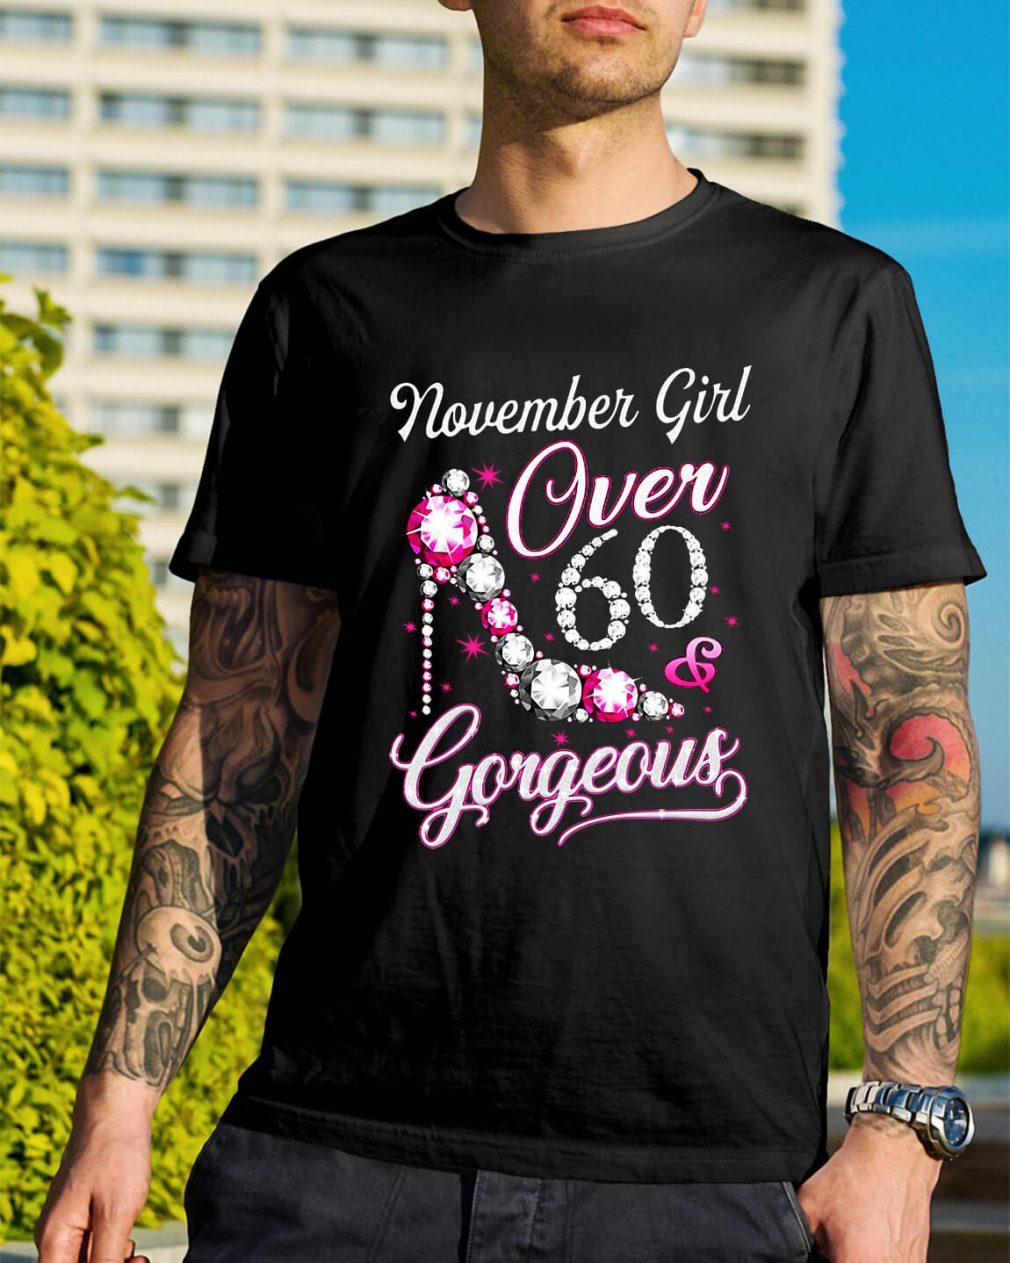 November girl over 60 and Gorgeous Guys Shirt